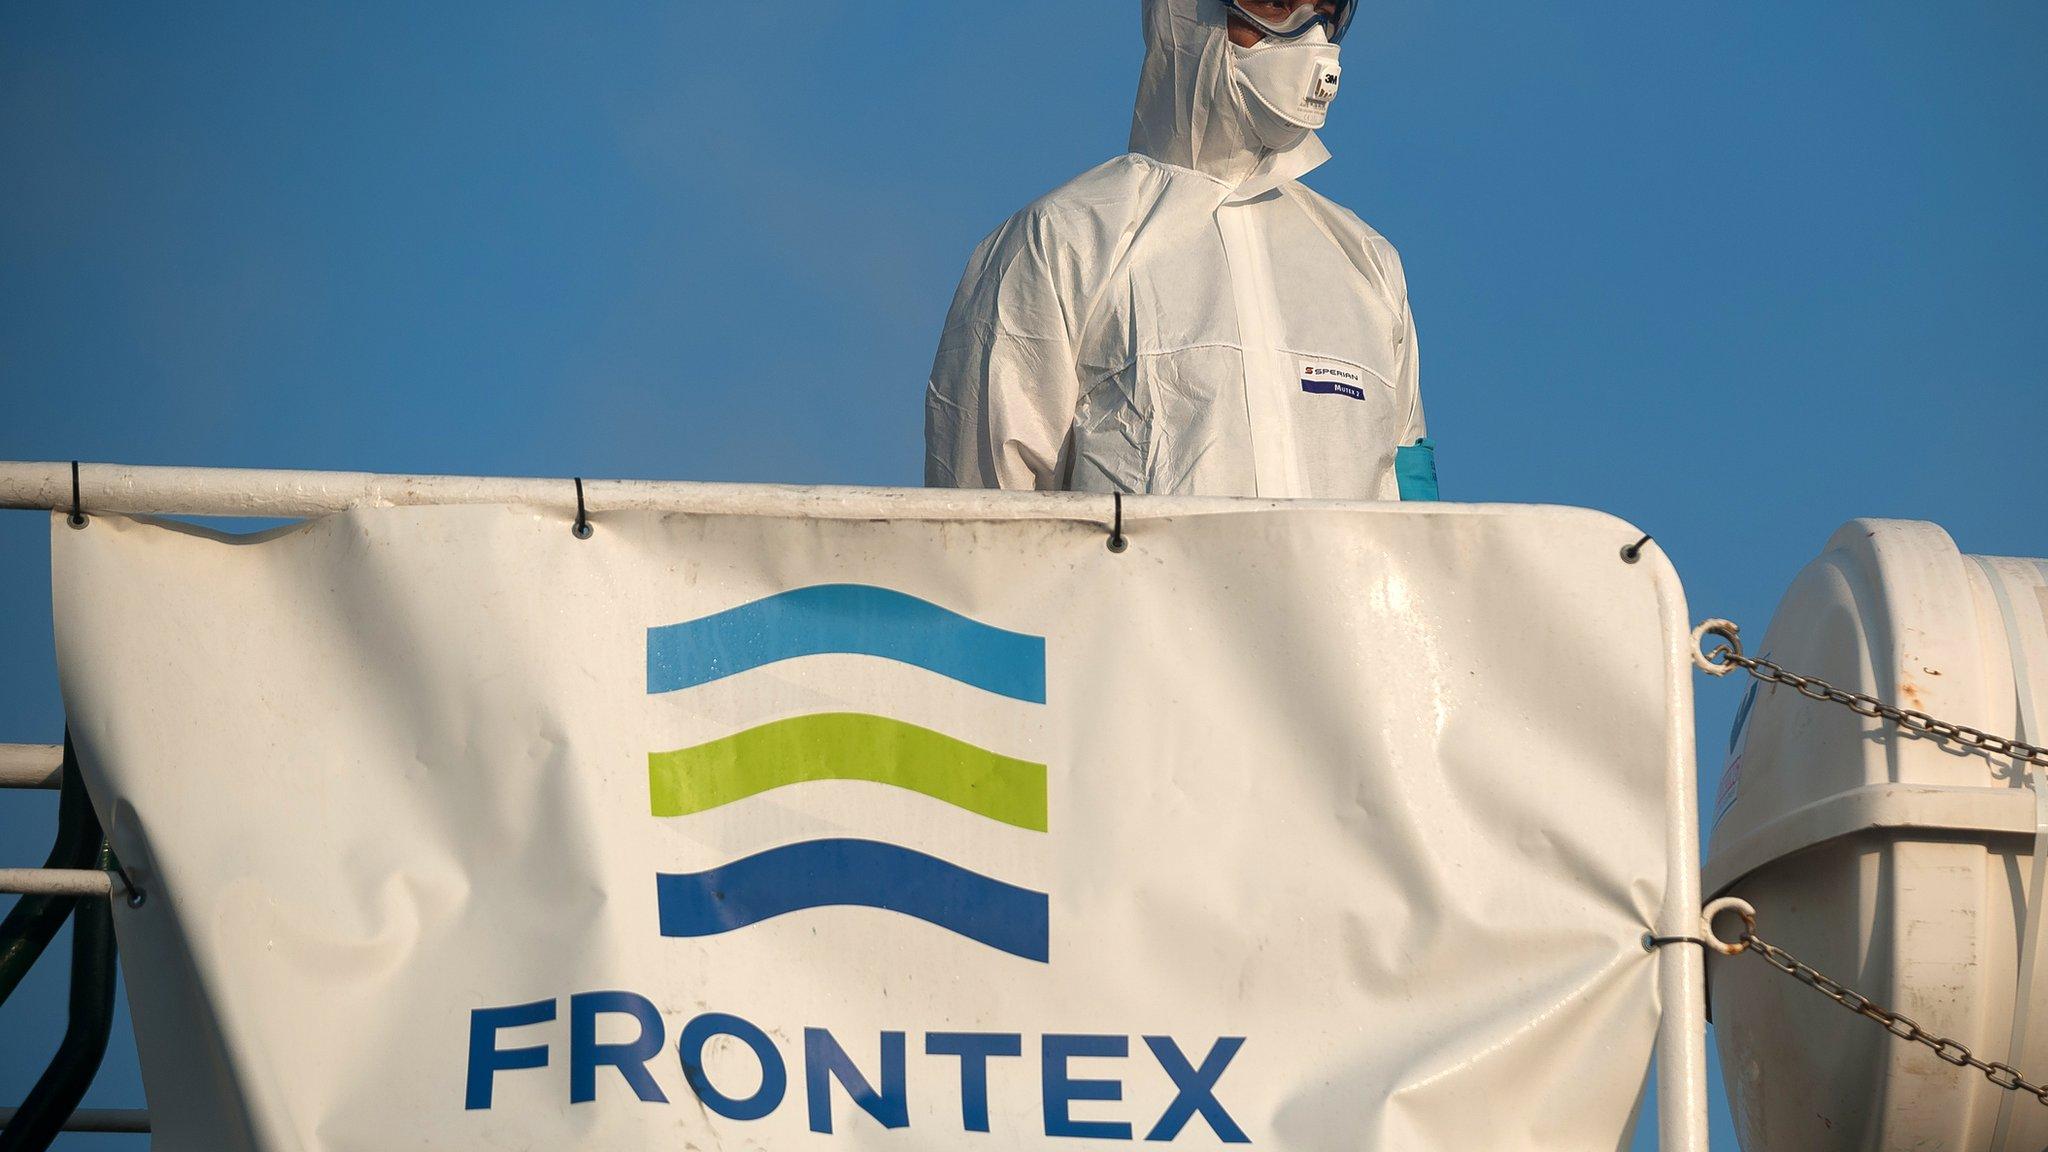 Отпор мигрантам: чем известна Frontex - погранслужба ЕС на границе Литвы и Беларуси